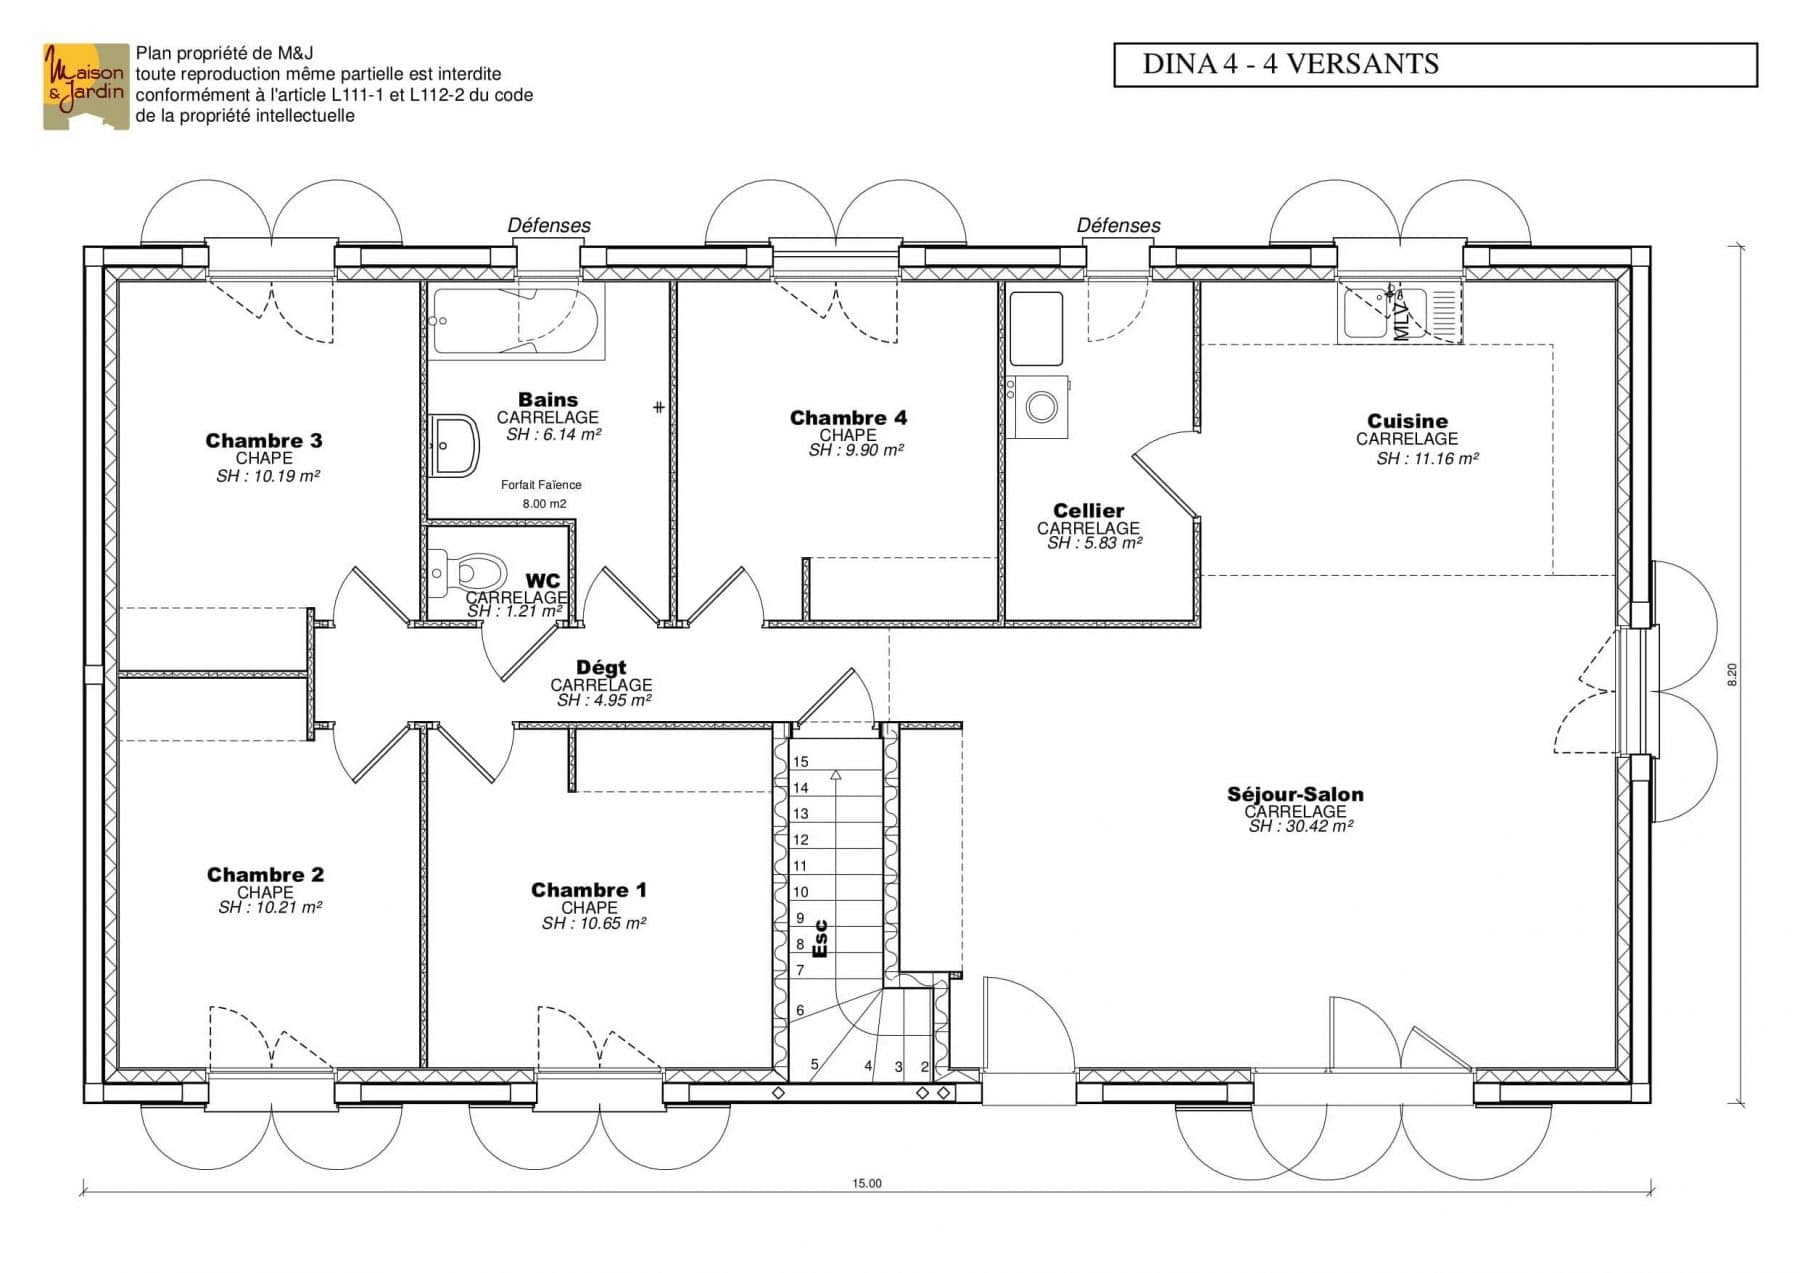 plan maison Dina101(4v)rdc sans cote